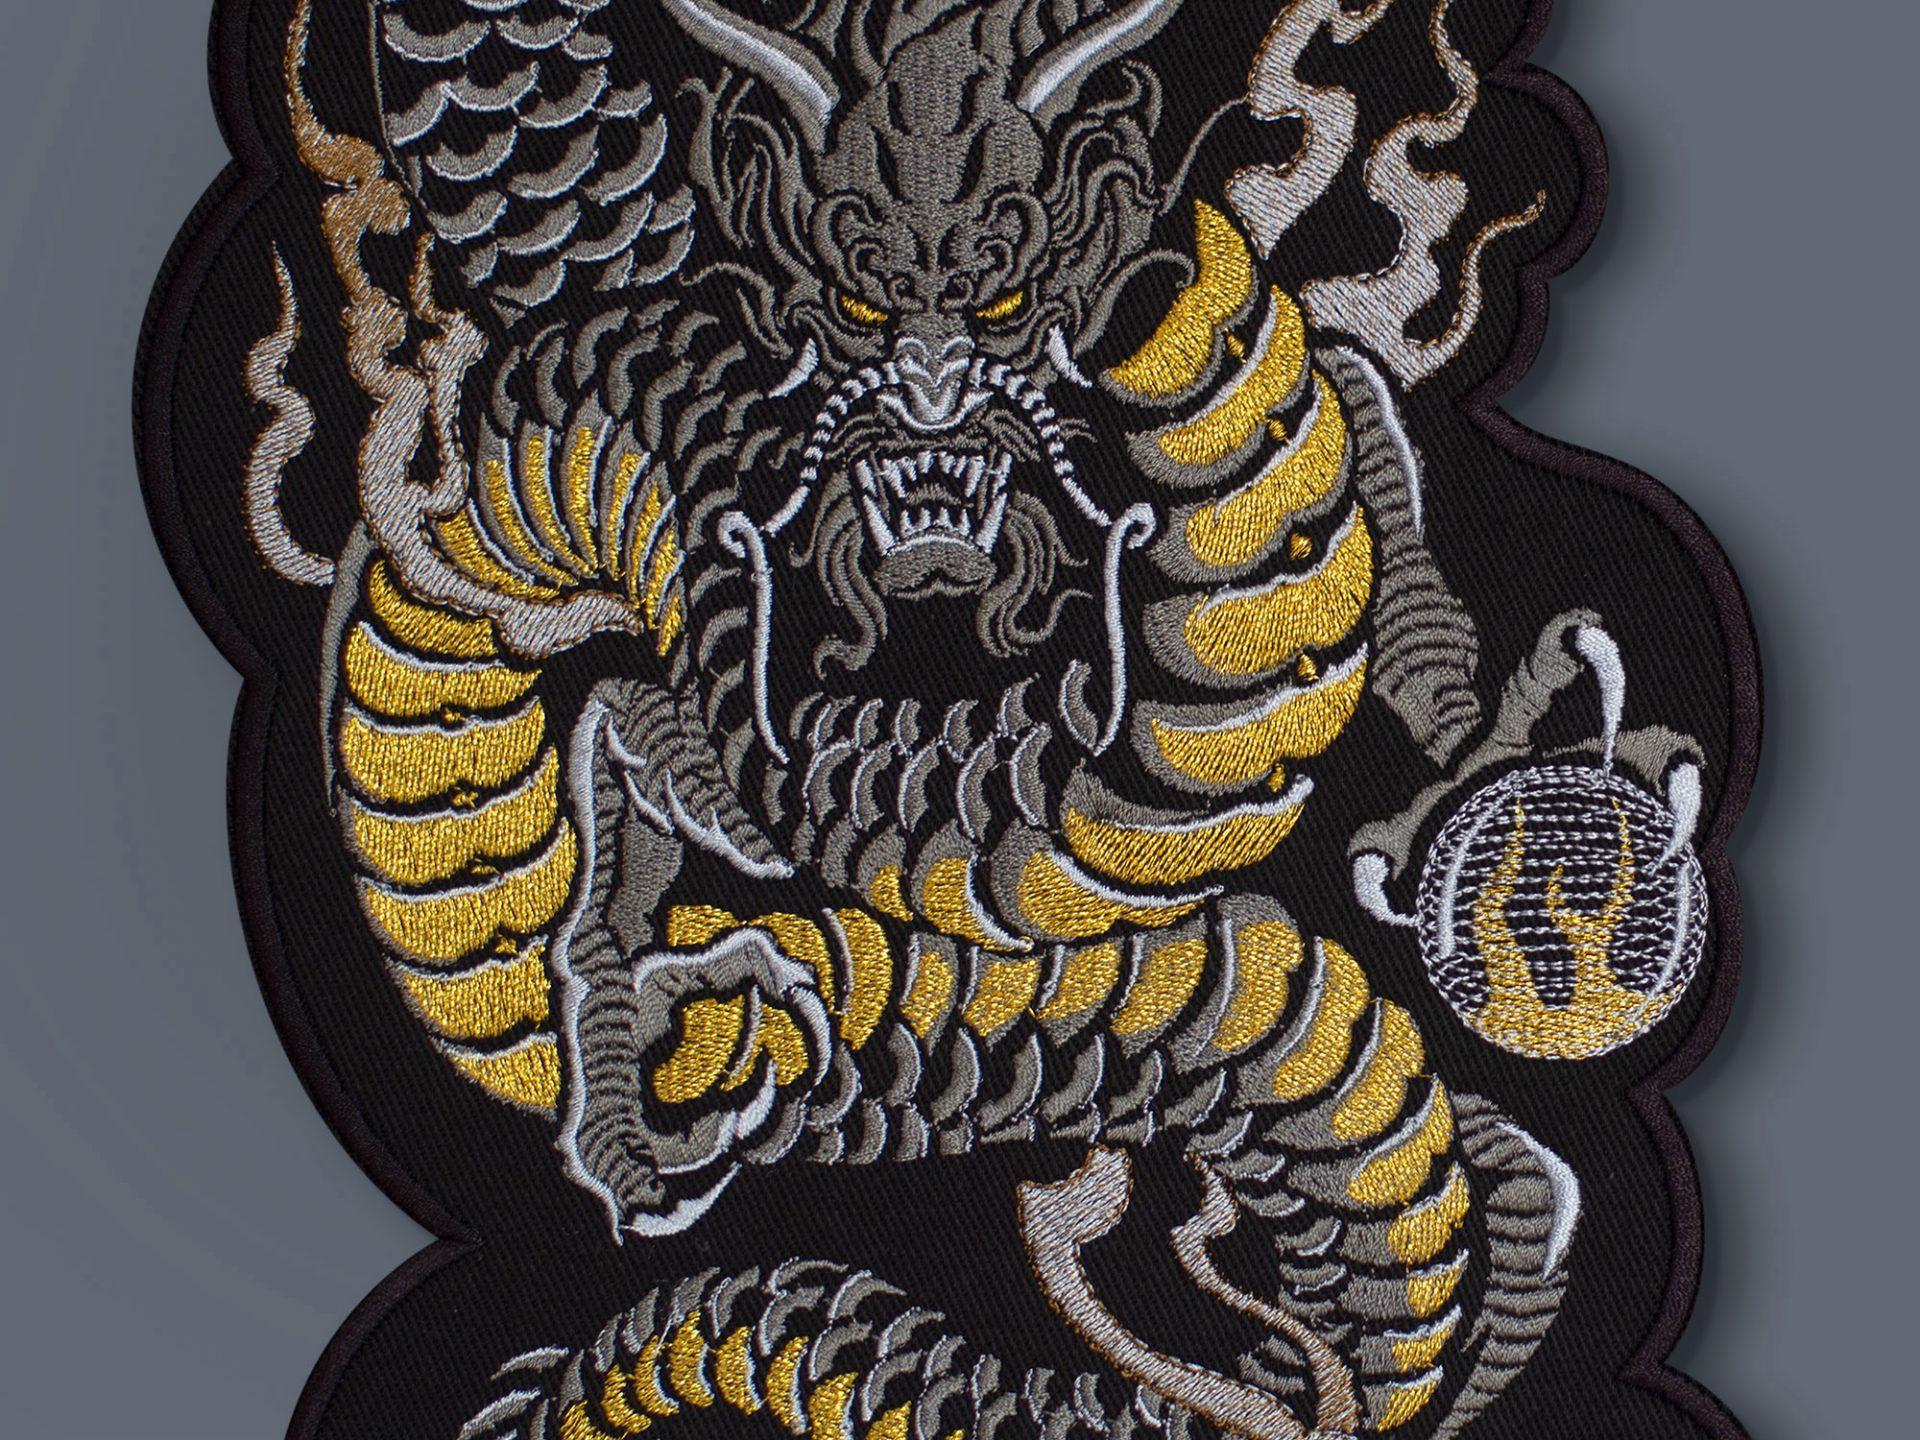 dragon_Lsize_gold_graphicine_shop_2